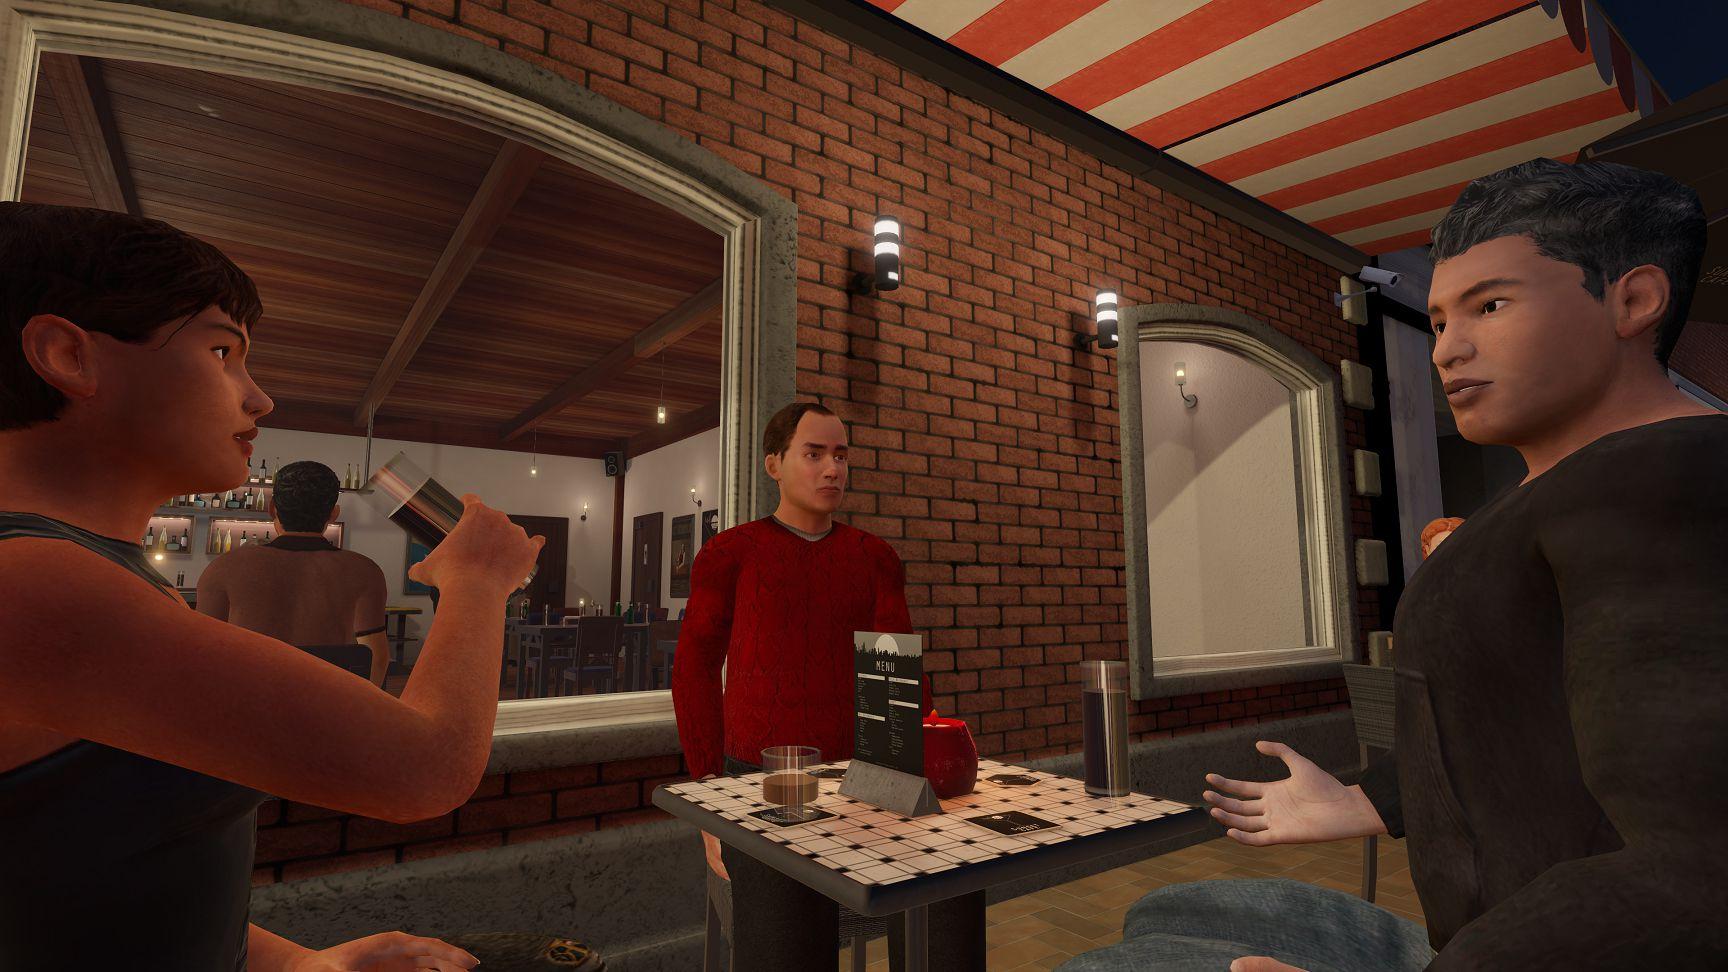 CleVR B.V. Delft - dynamisch interactieve VR - Café - interactie samen aan tafel -kopie